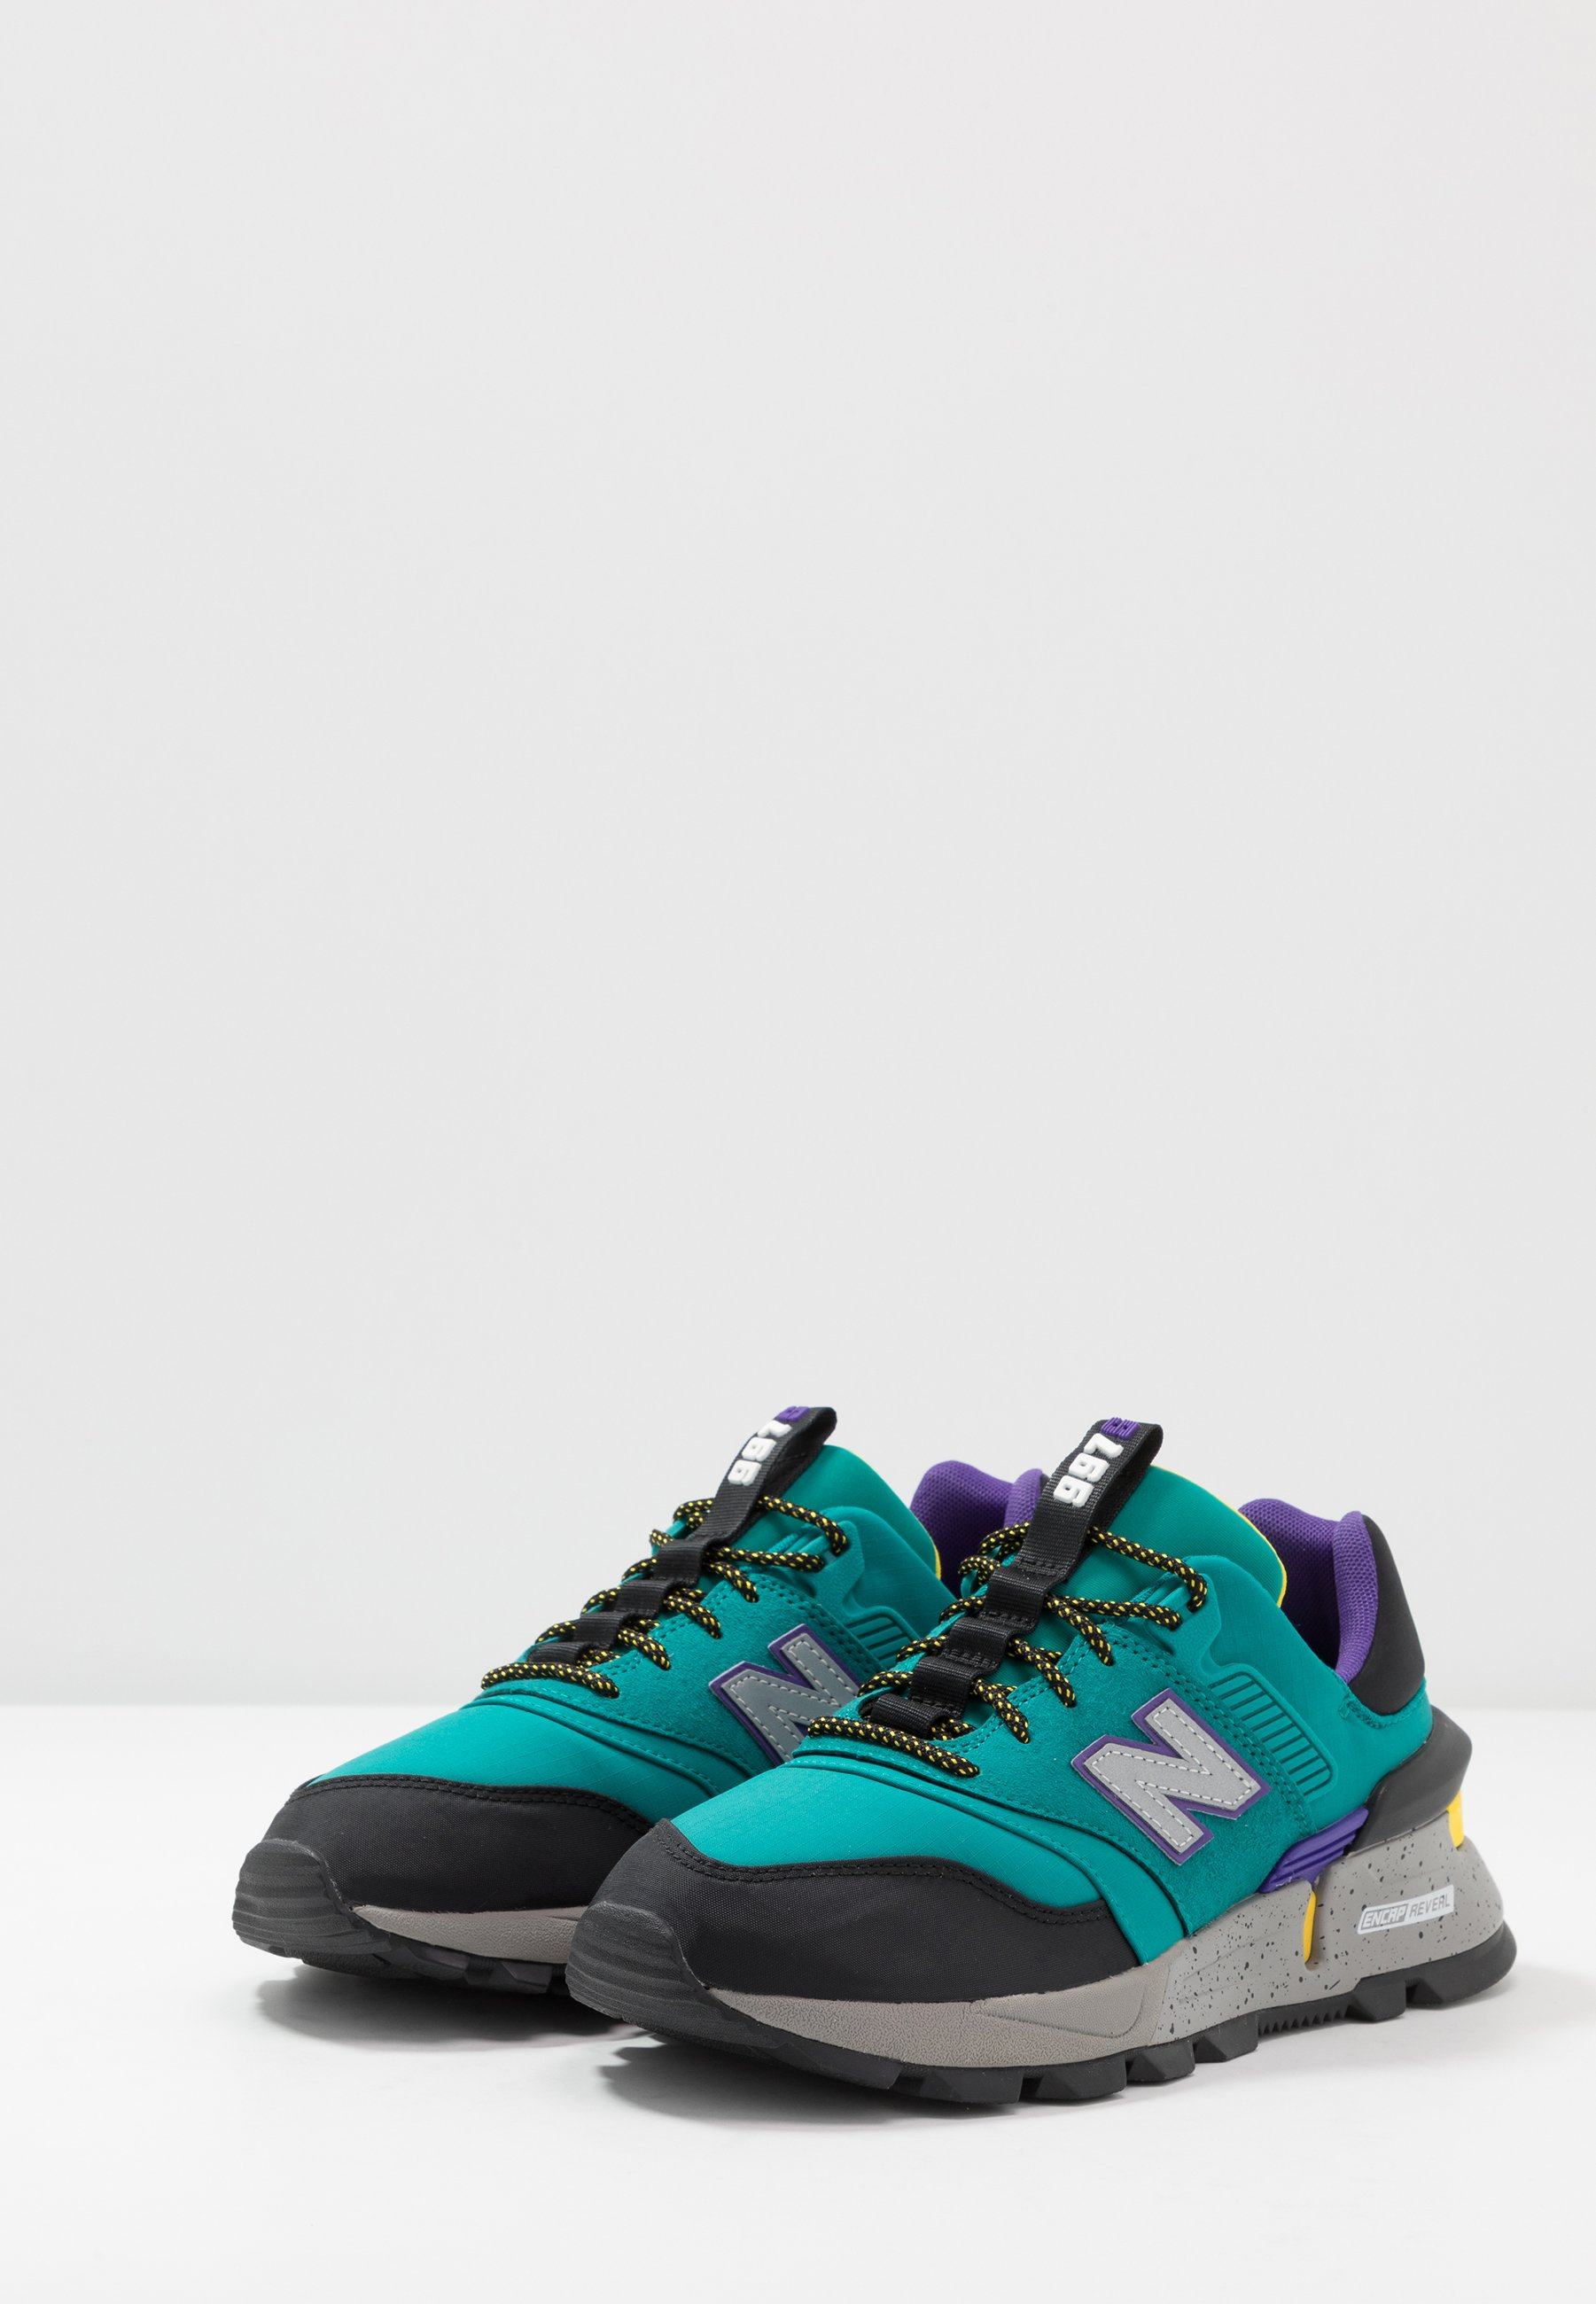 New Balance 997 S - Sneakers basse - green/black/petrolio - Zalando.it